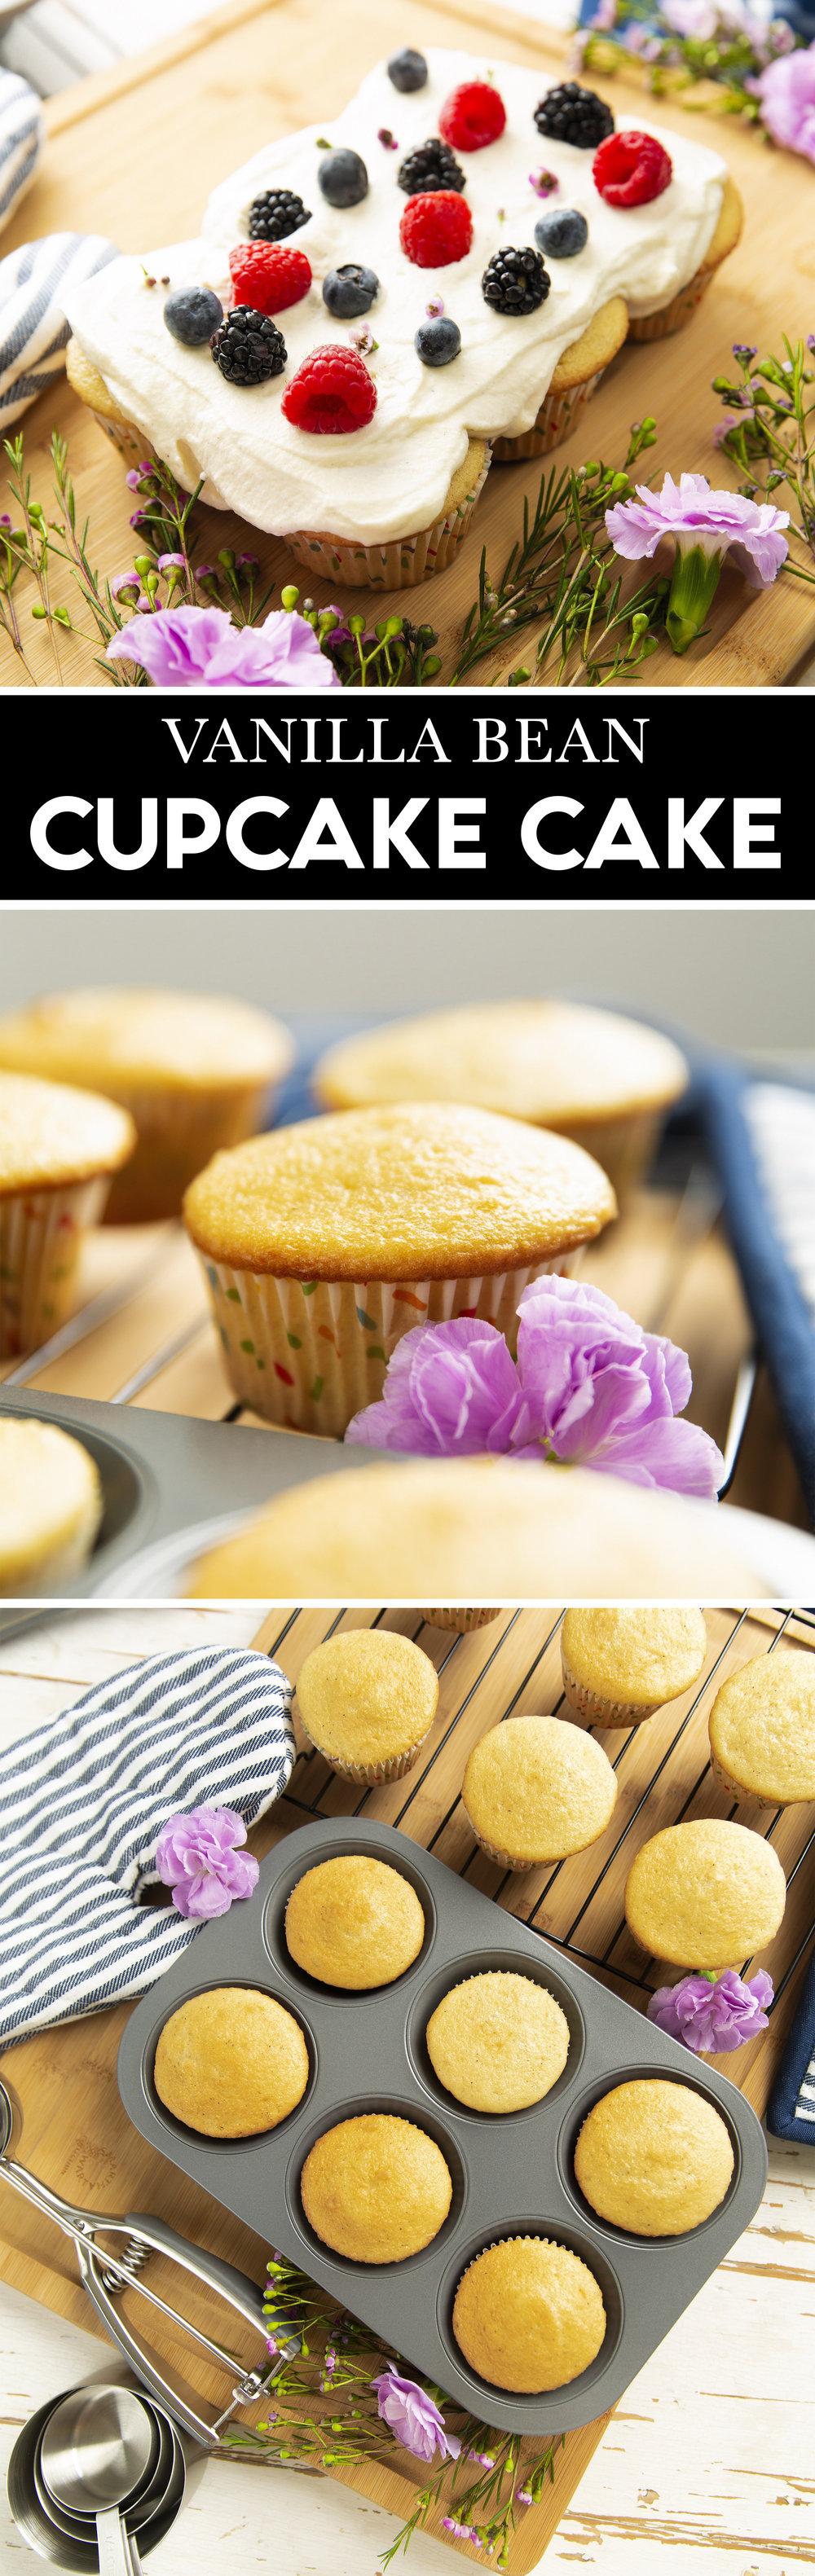 Pull Apart Cupcake Cake Recipe